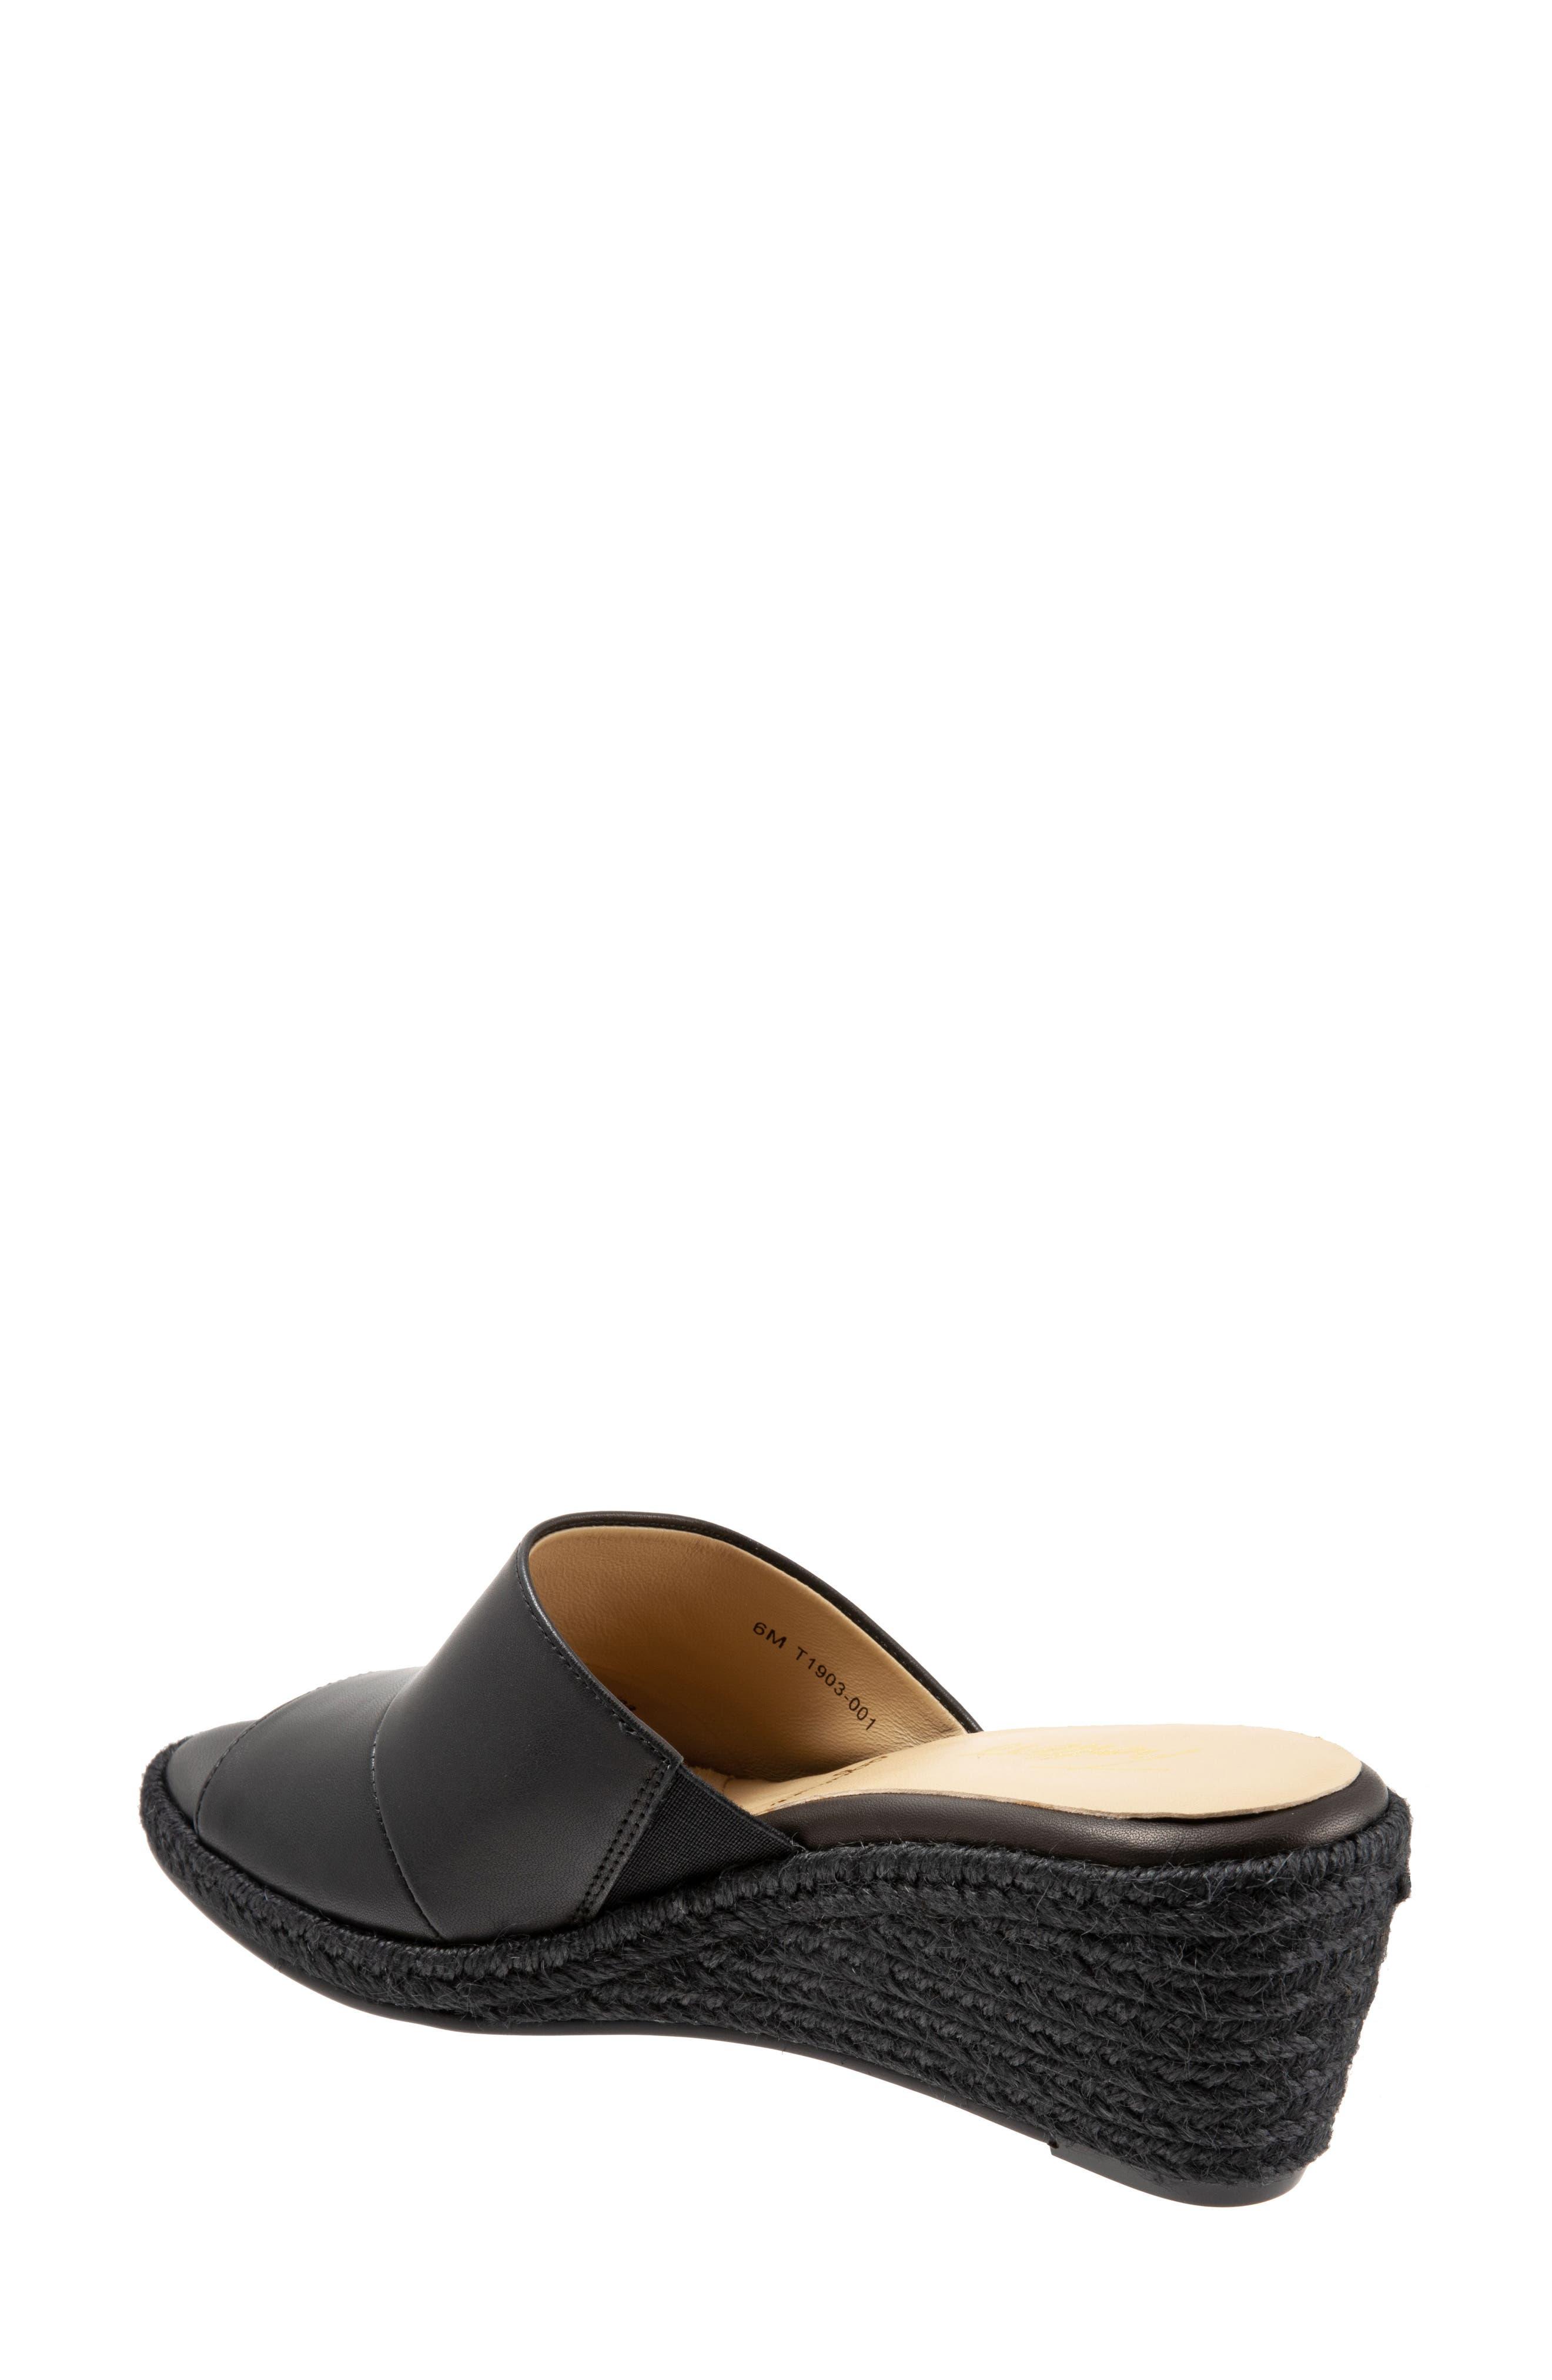 TROTTERS, Colony Wedge Slide Sandal, Alternate thumbnail 2, color, BLACK LEATHER